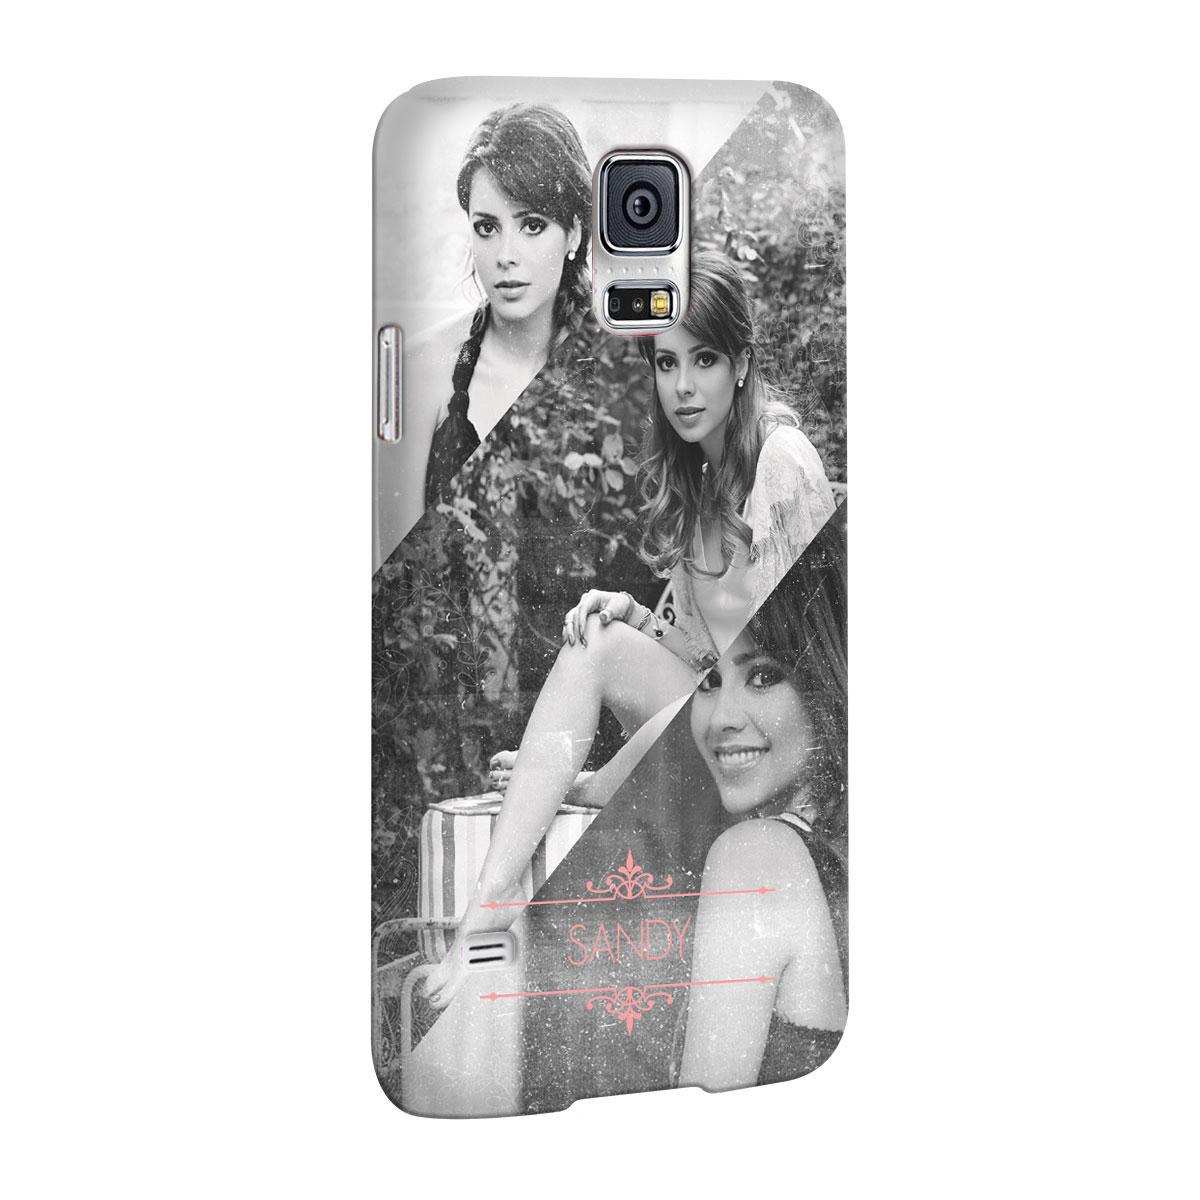 Capa para Samsung Galaxy S5 Sandy Pictures